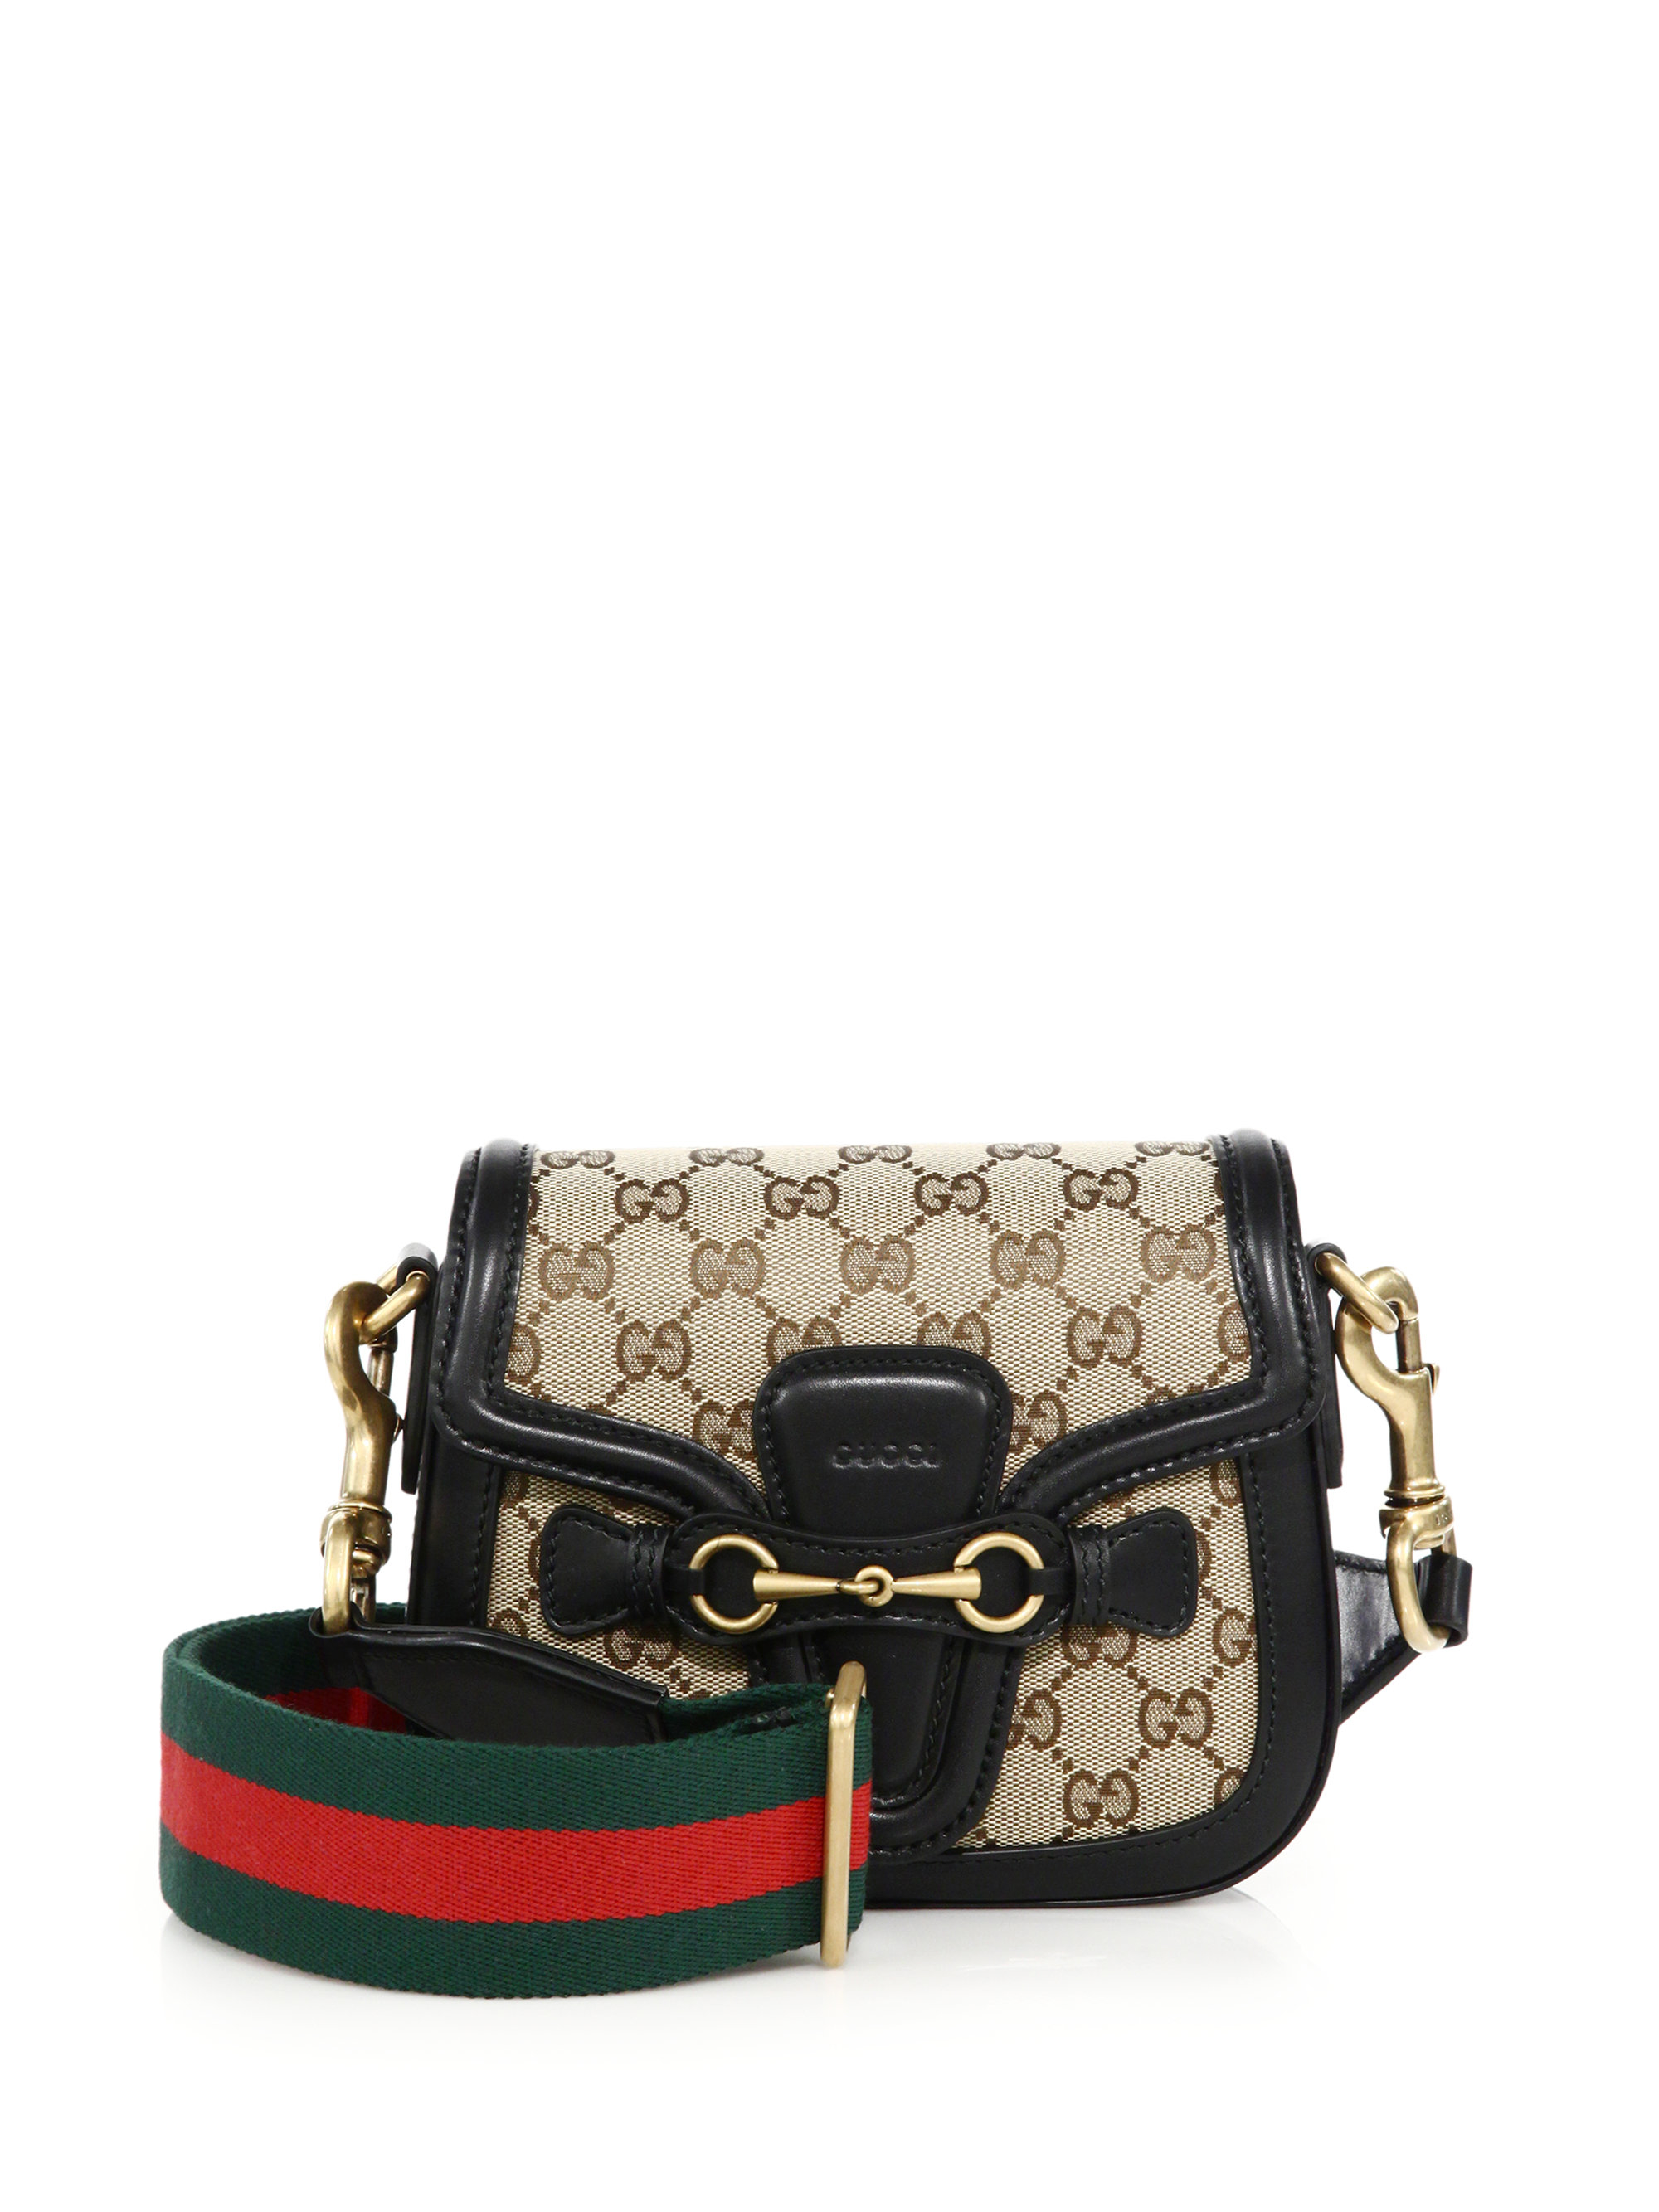 3eebbeb207a4 Lyst - Gucci Lady Web Small GG Supreme Canvas Shoulder Bag in Natural